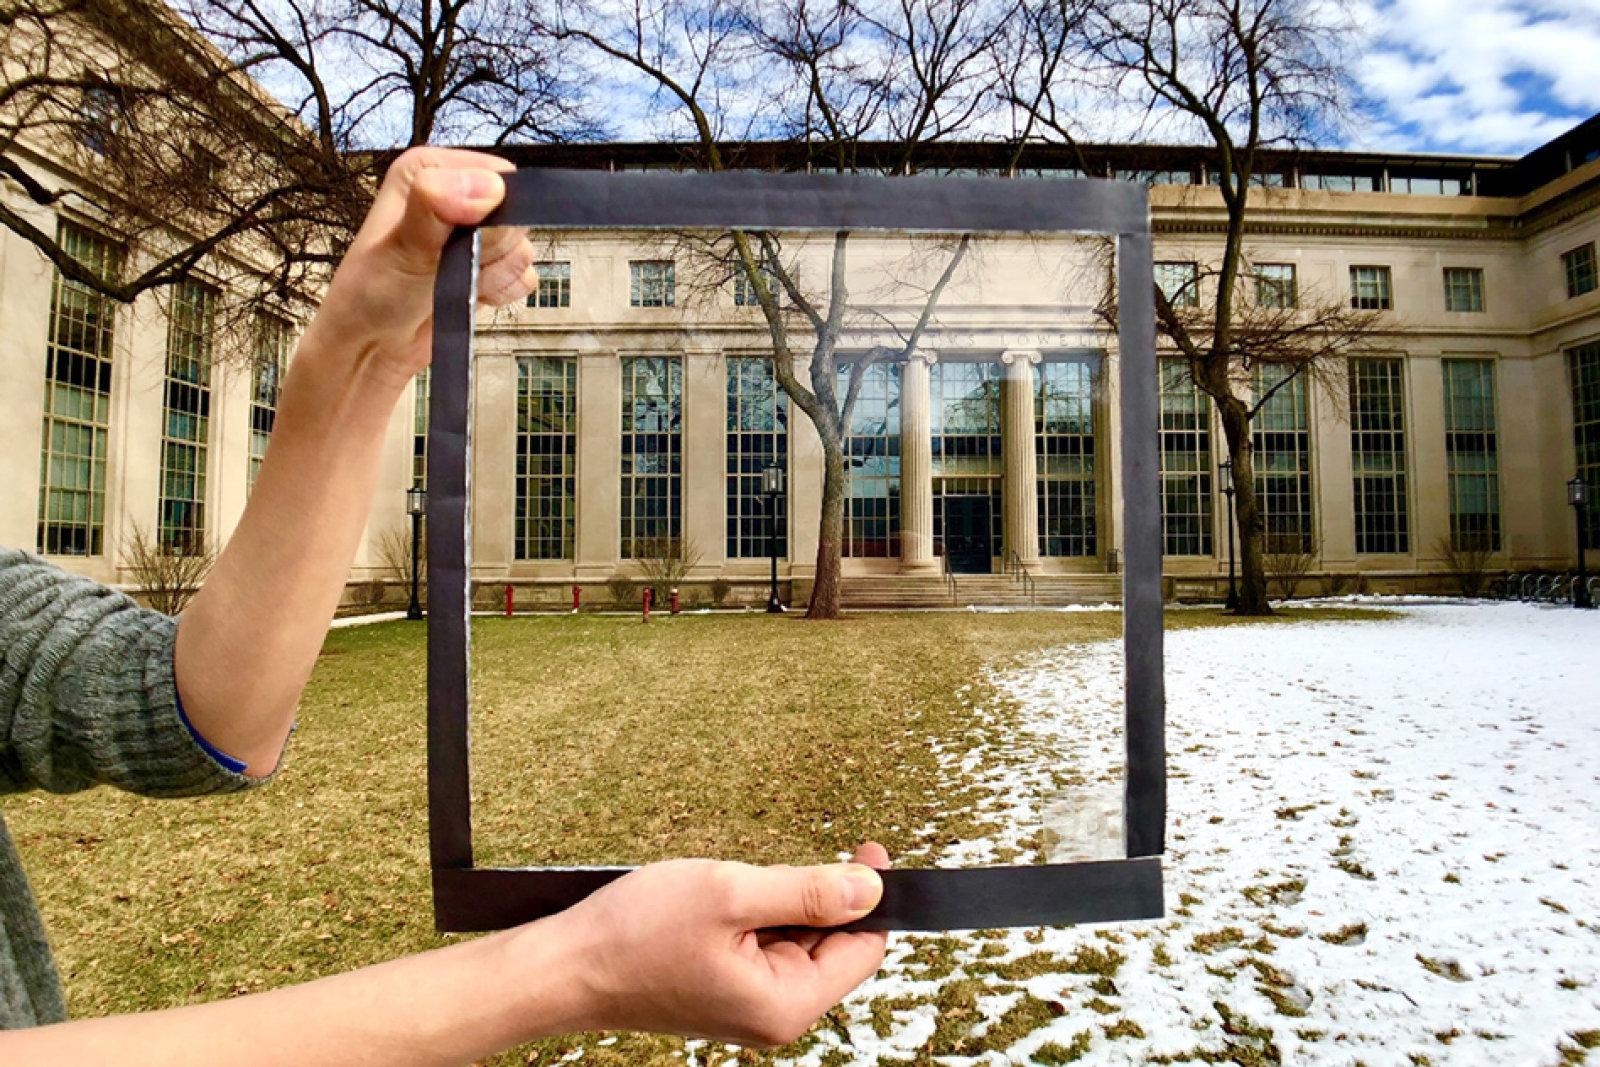 Pellicola finestre risparmio energetico